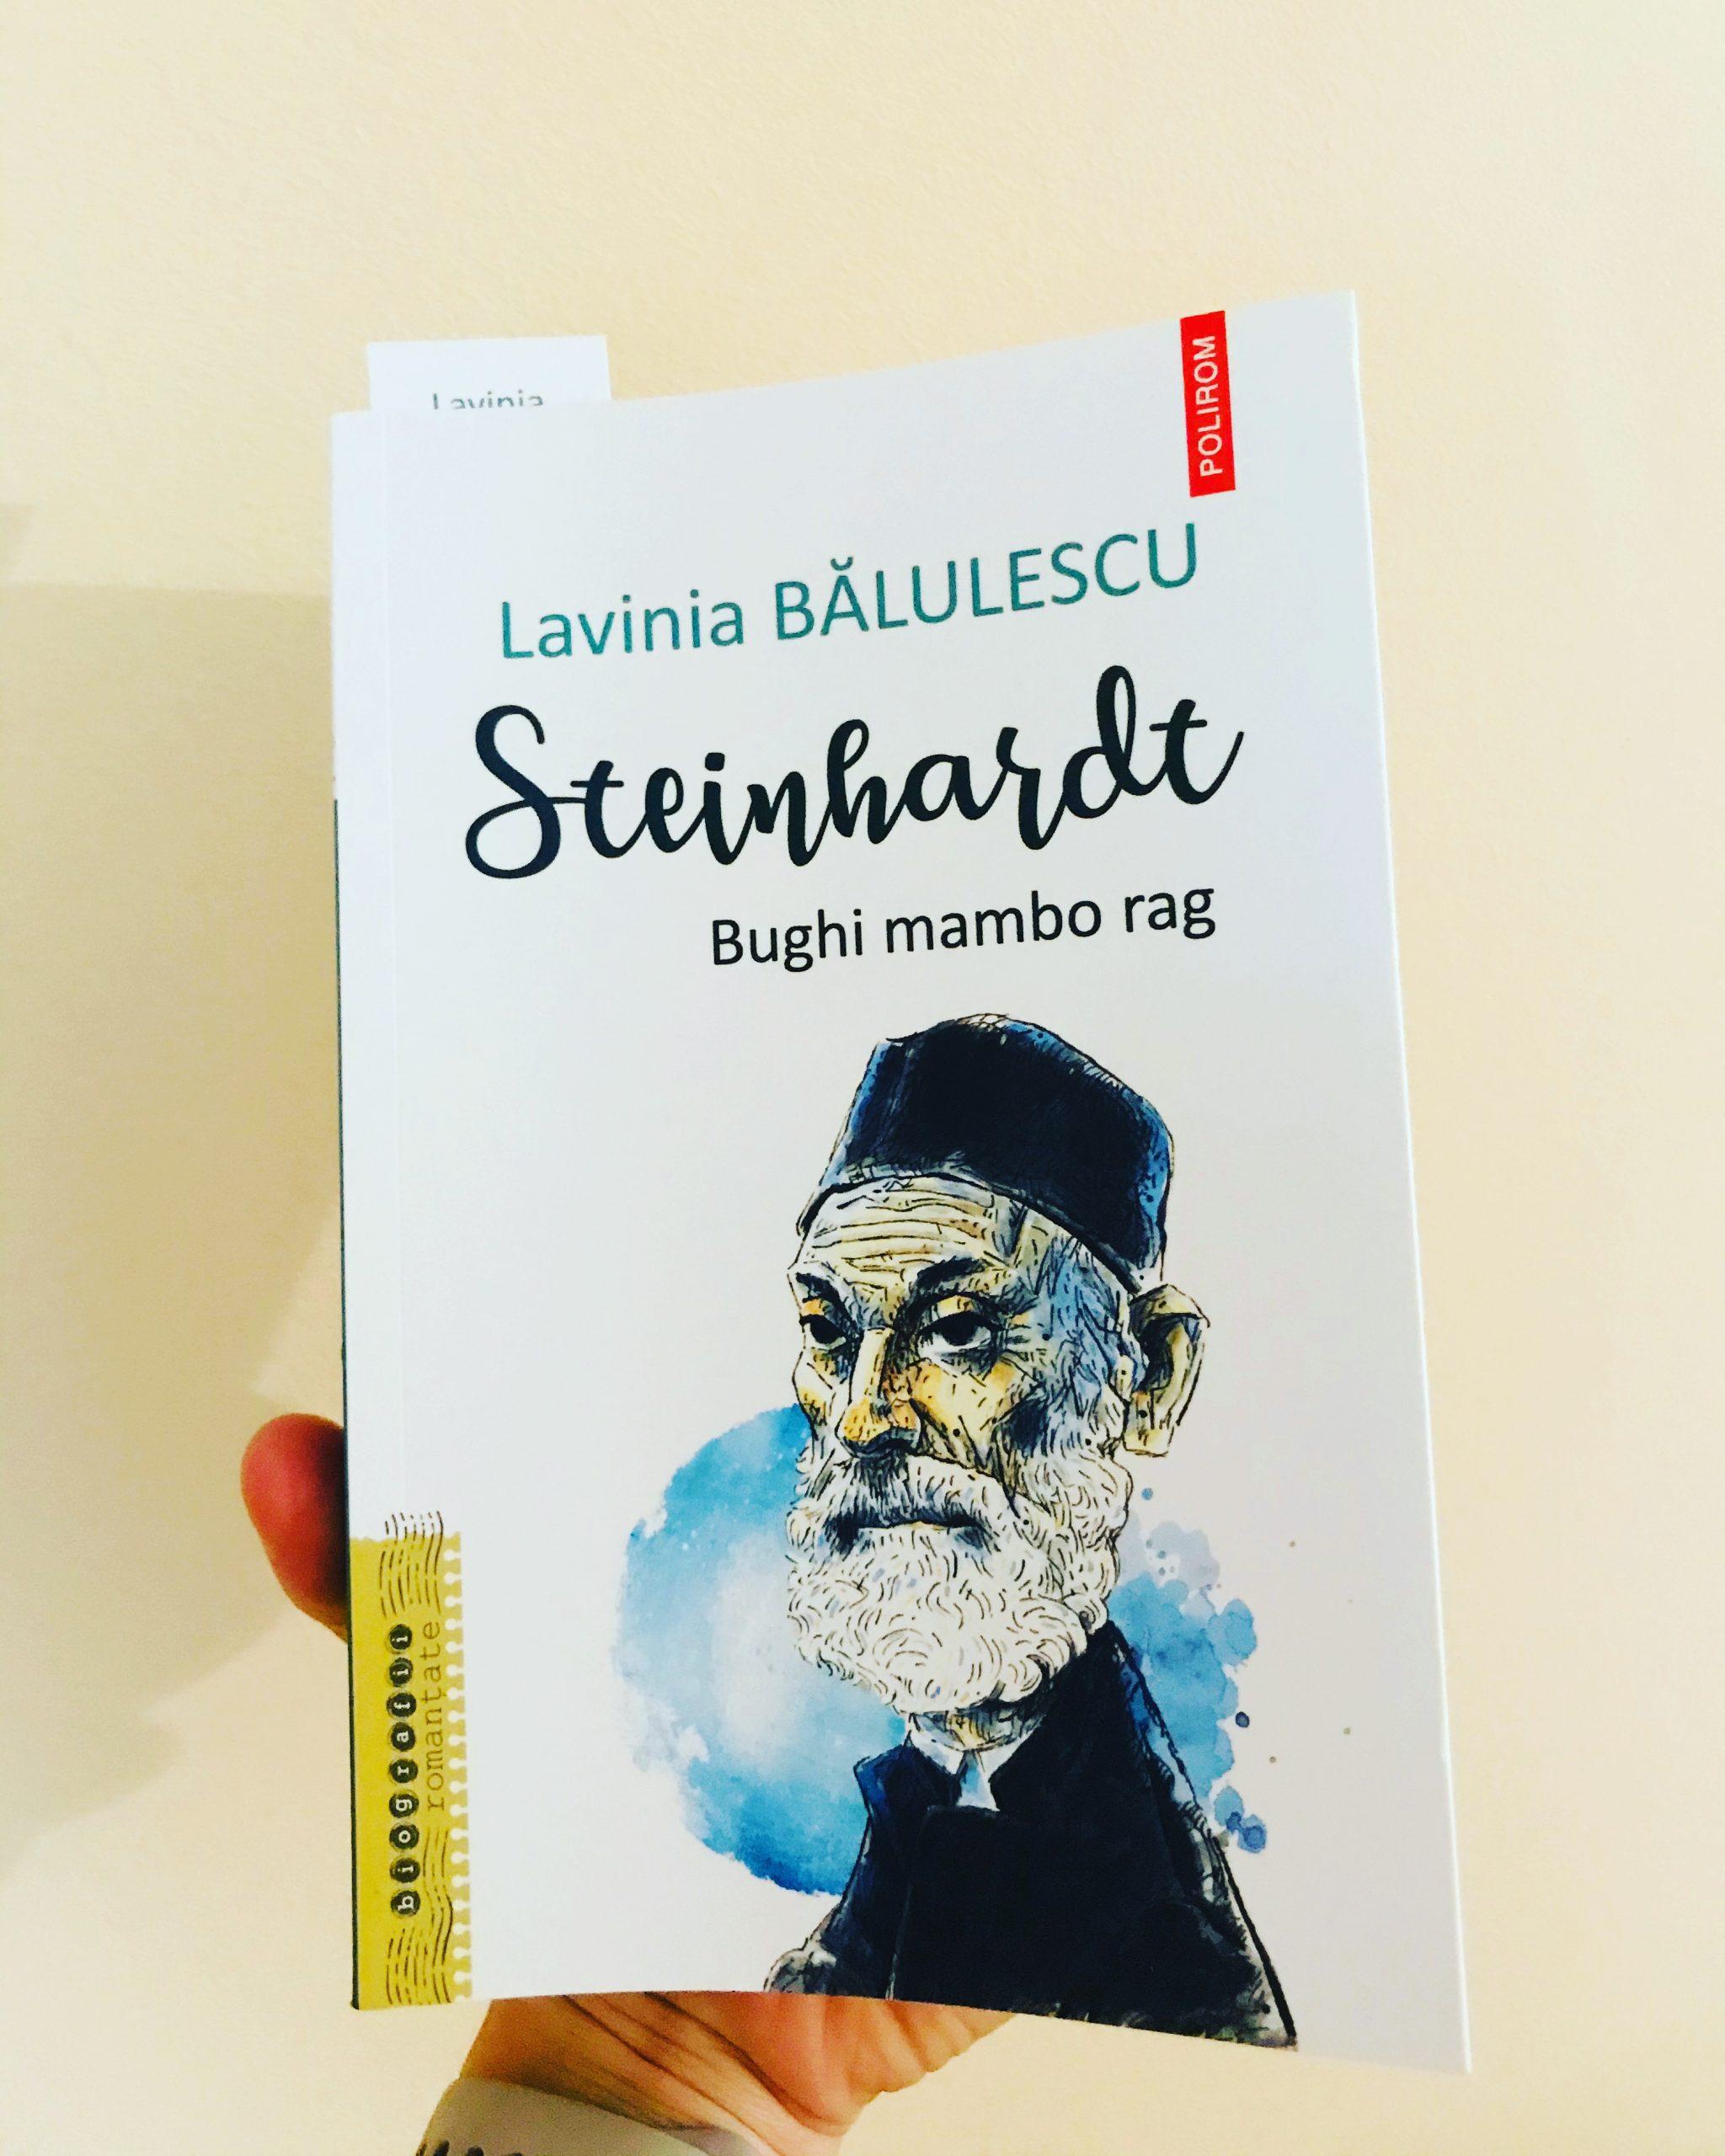 Steinhardt, Lavinia Bălulescu